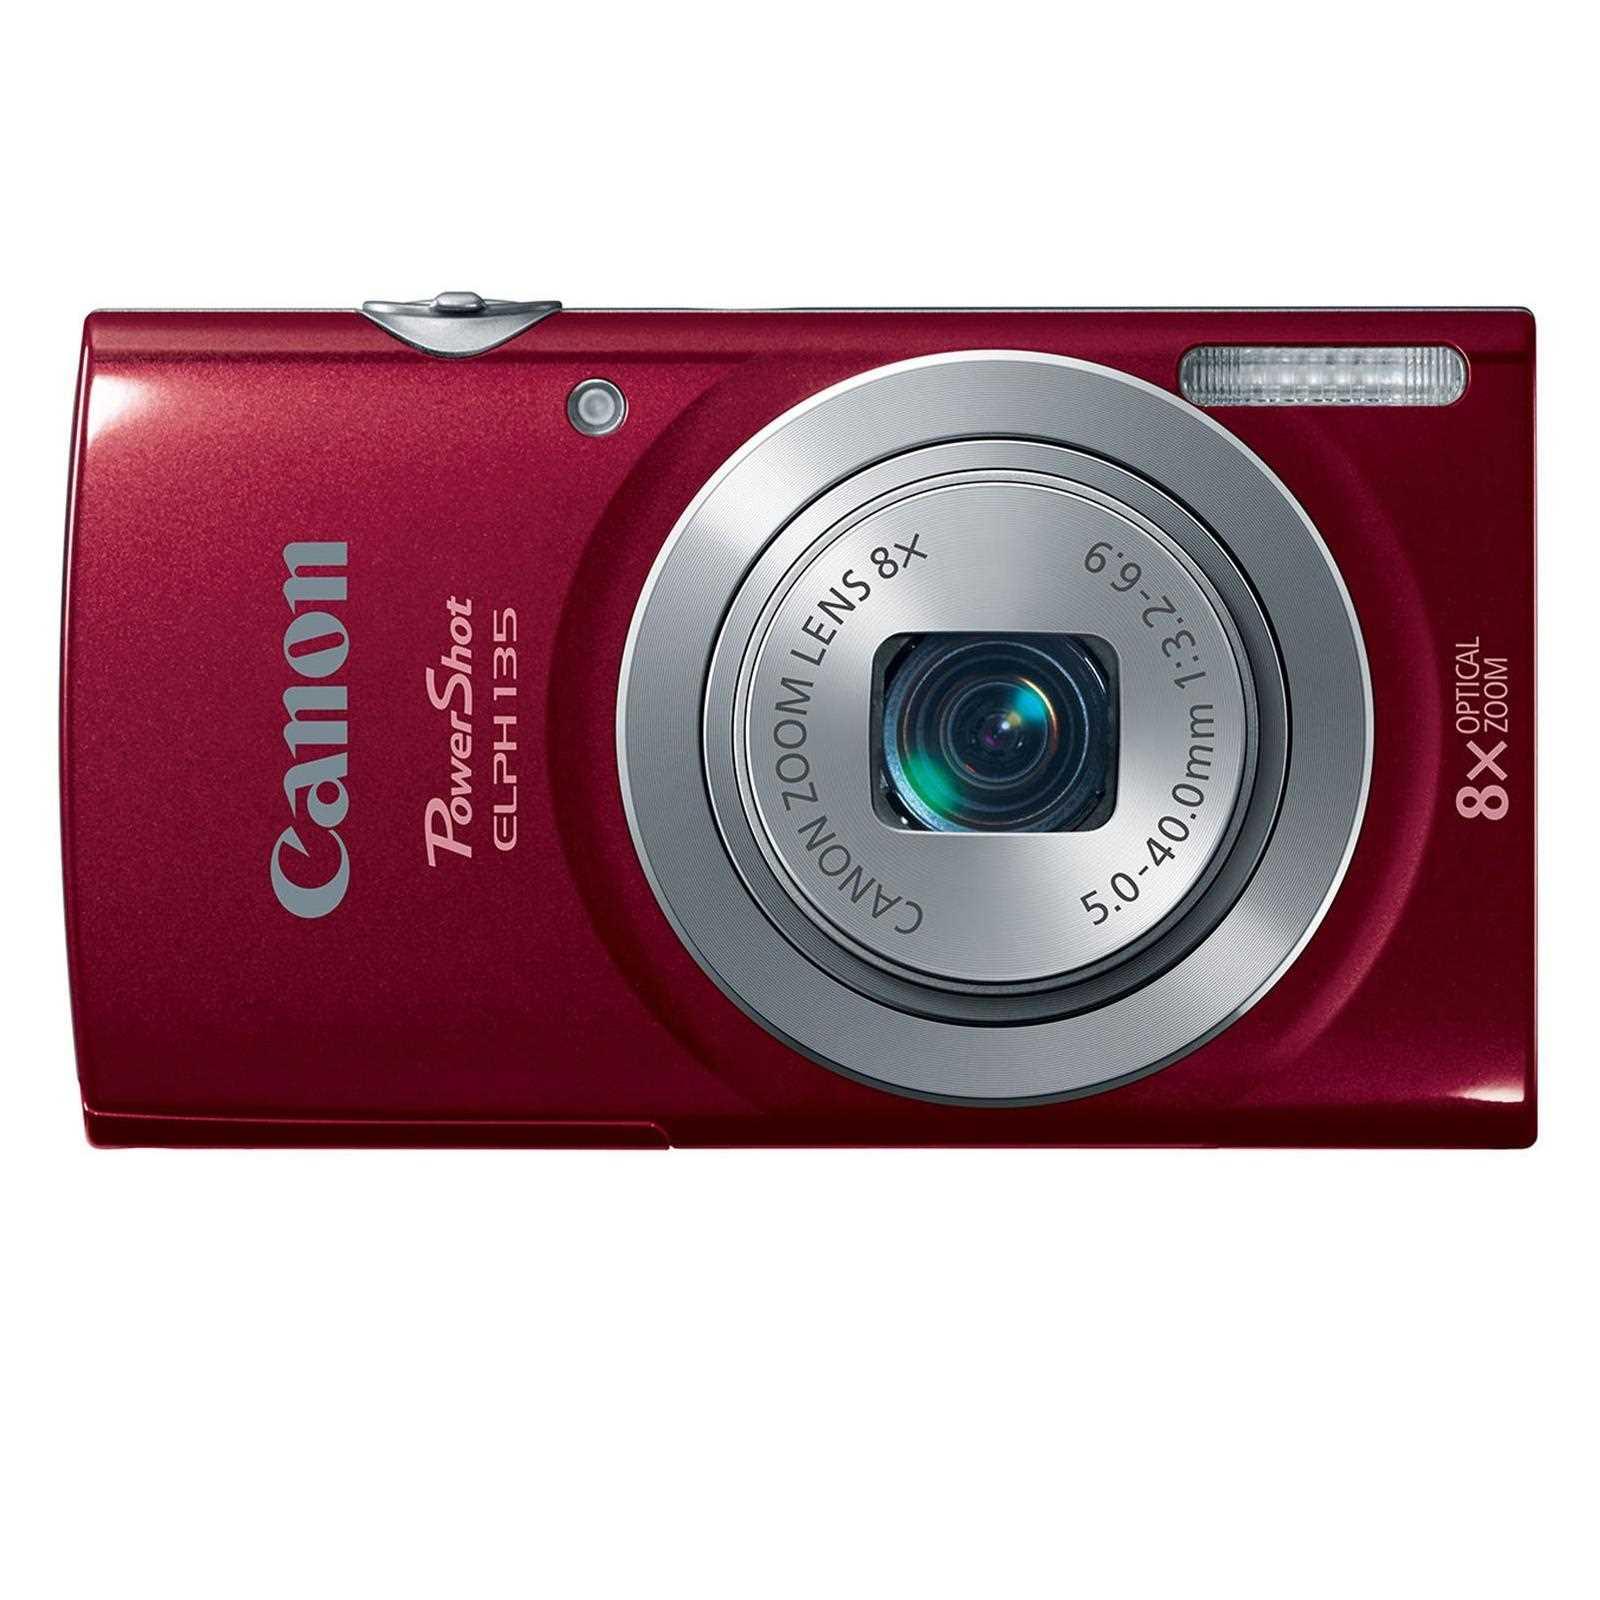 Canon PowerShot ELPH 135 IS Camera